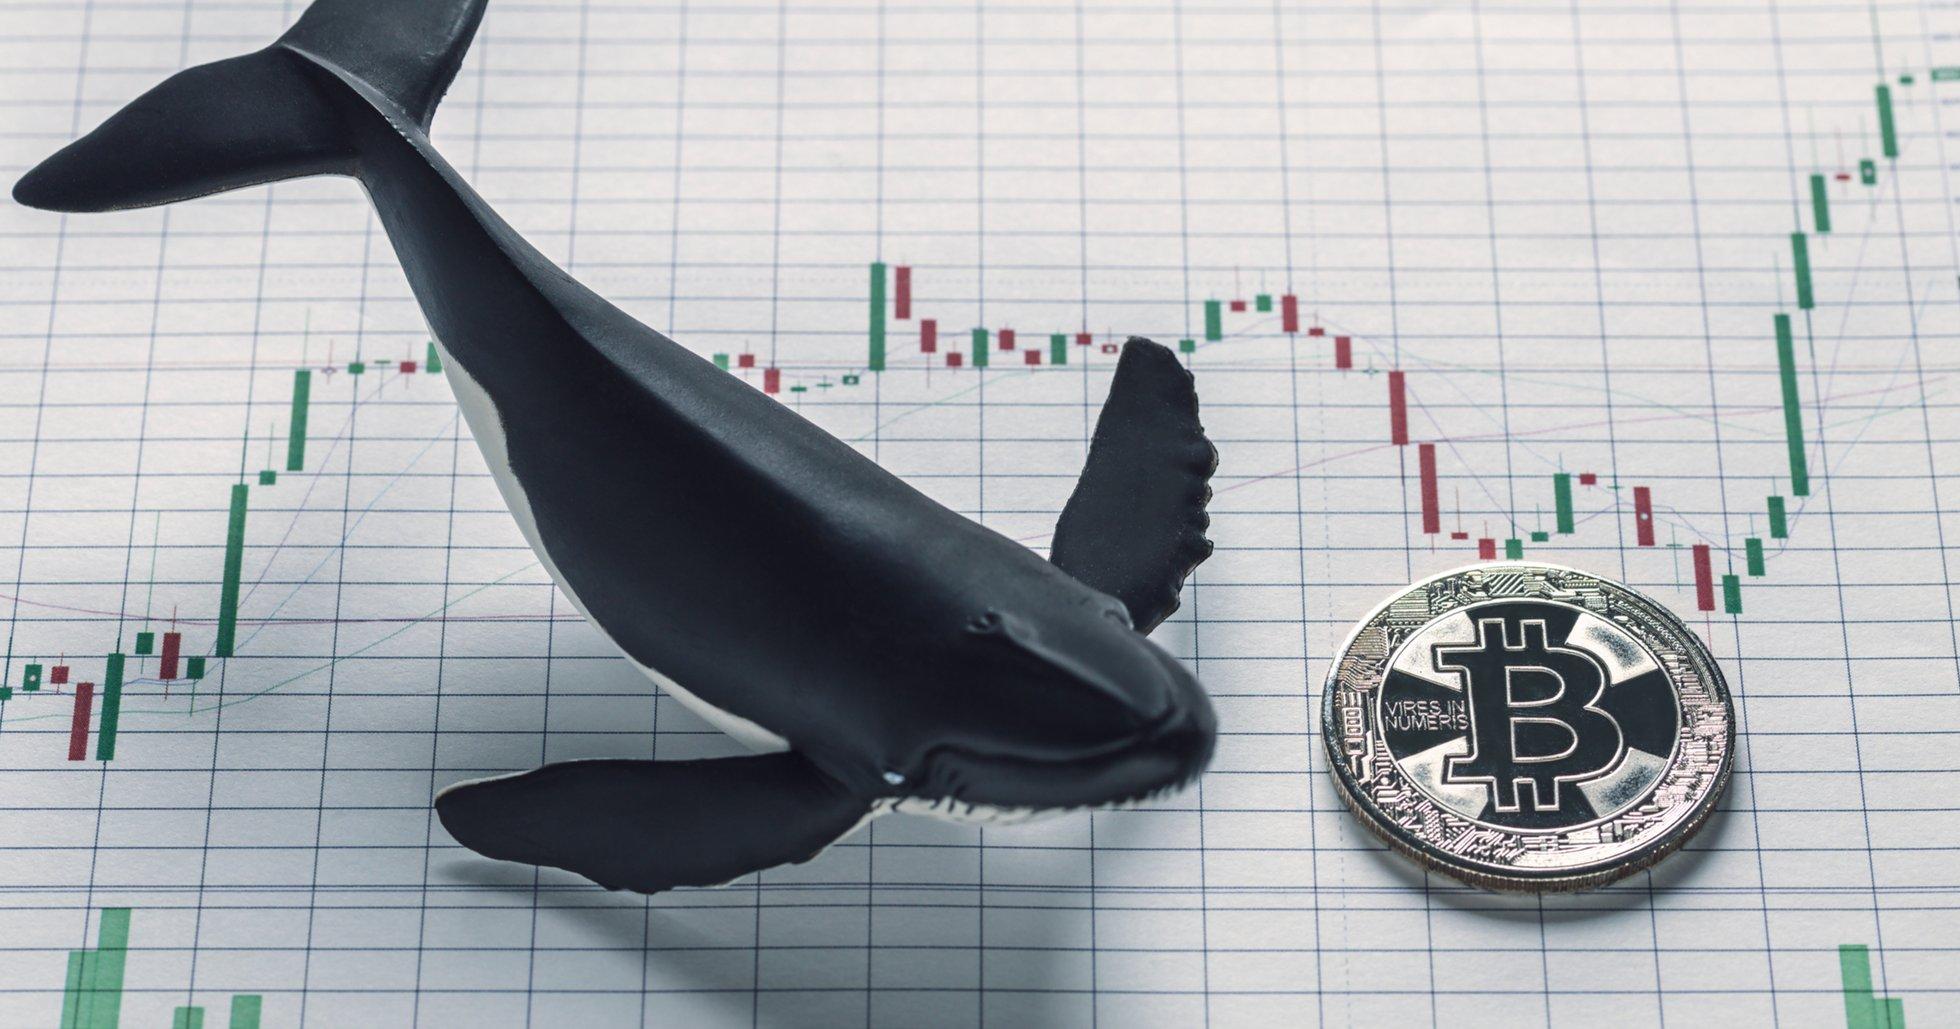 Analys visar: Bitcoins senaste krasch under 10 000 dollar var inte manipulation.